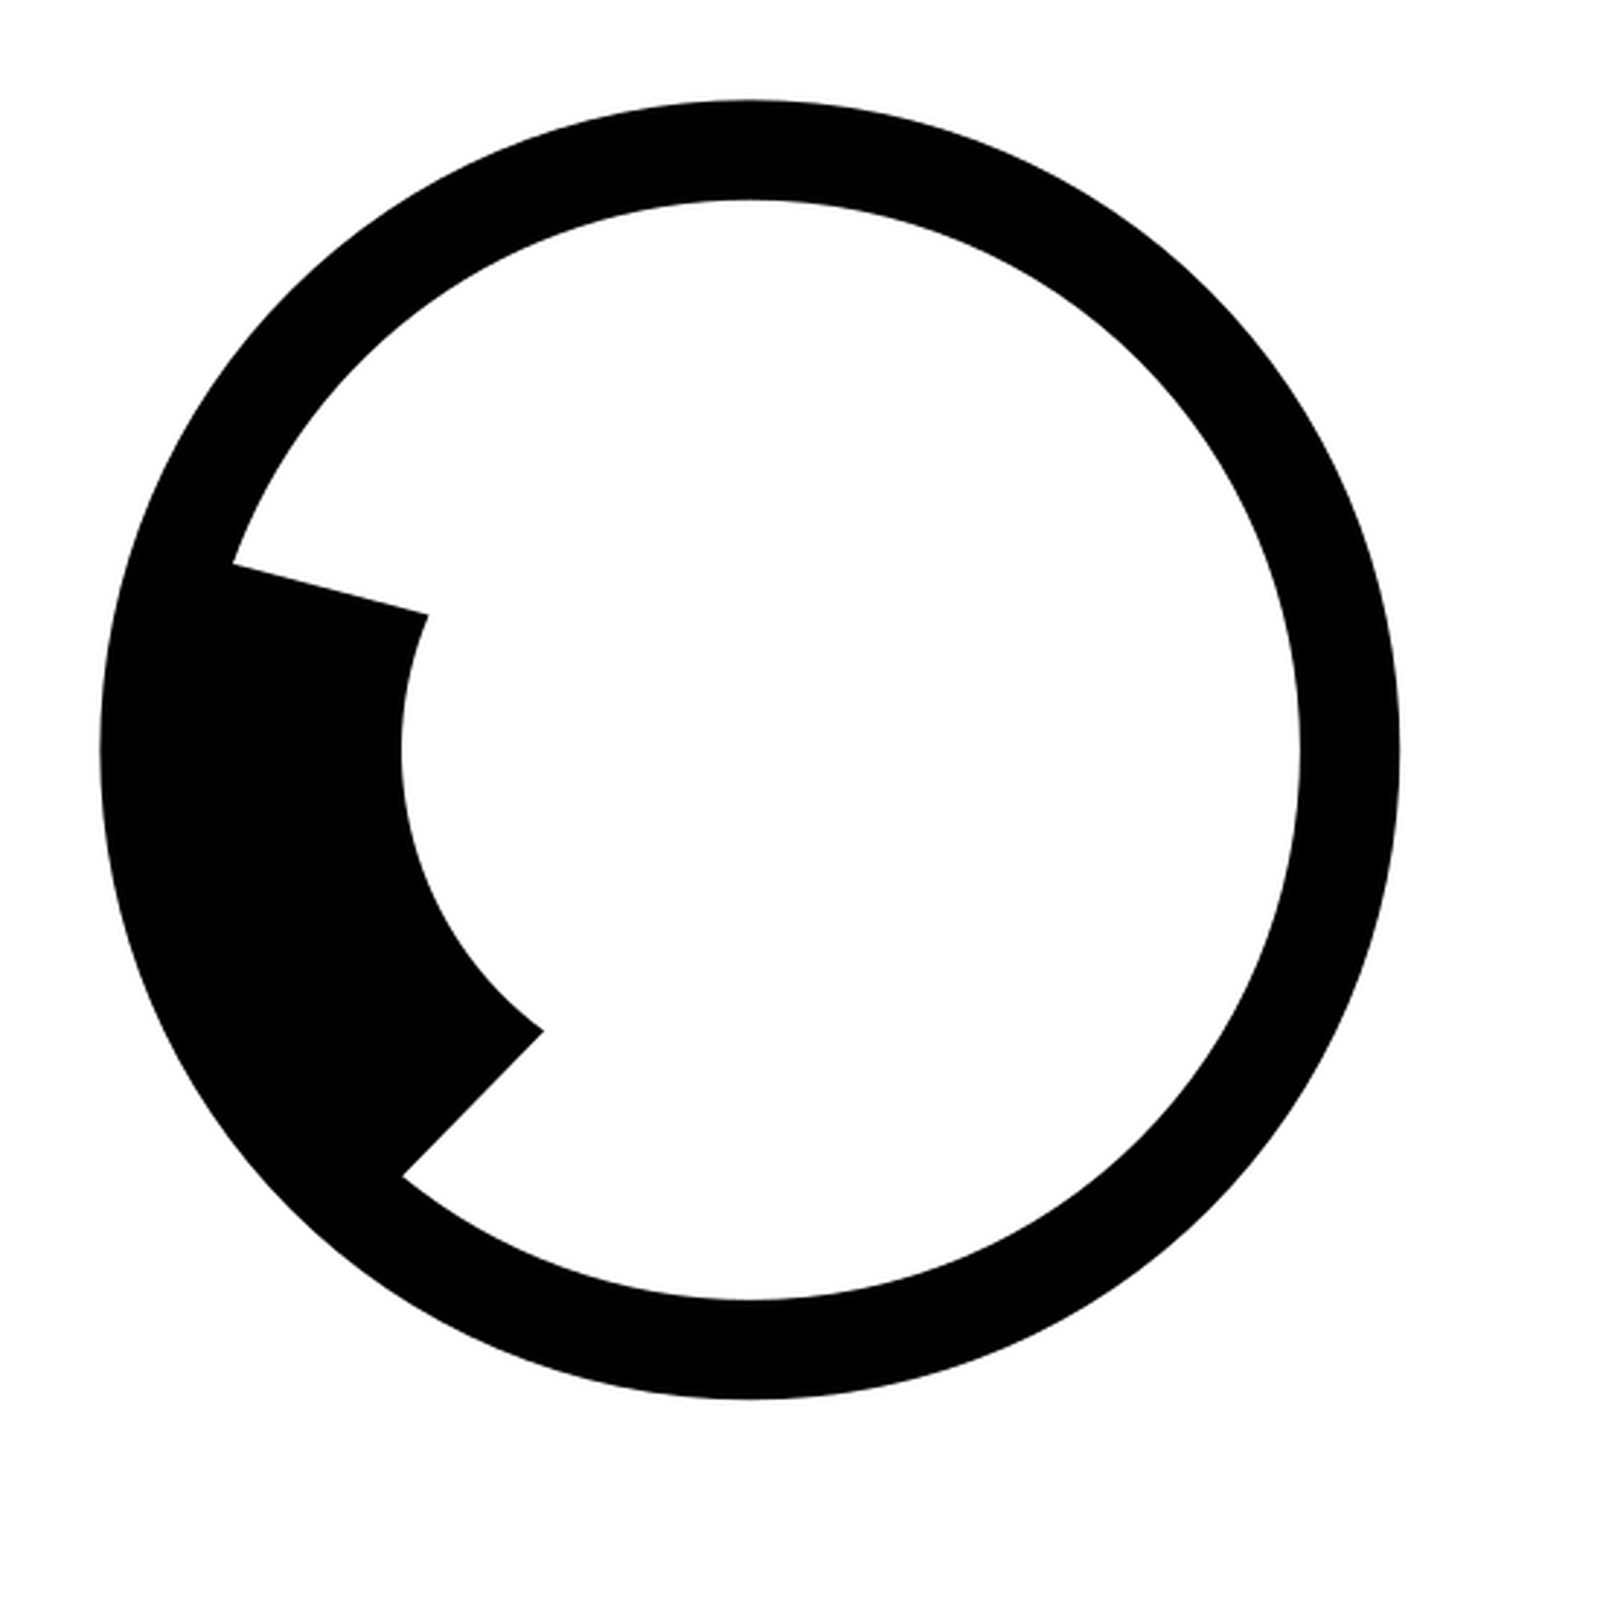 Light Dimming 20 Percent icon